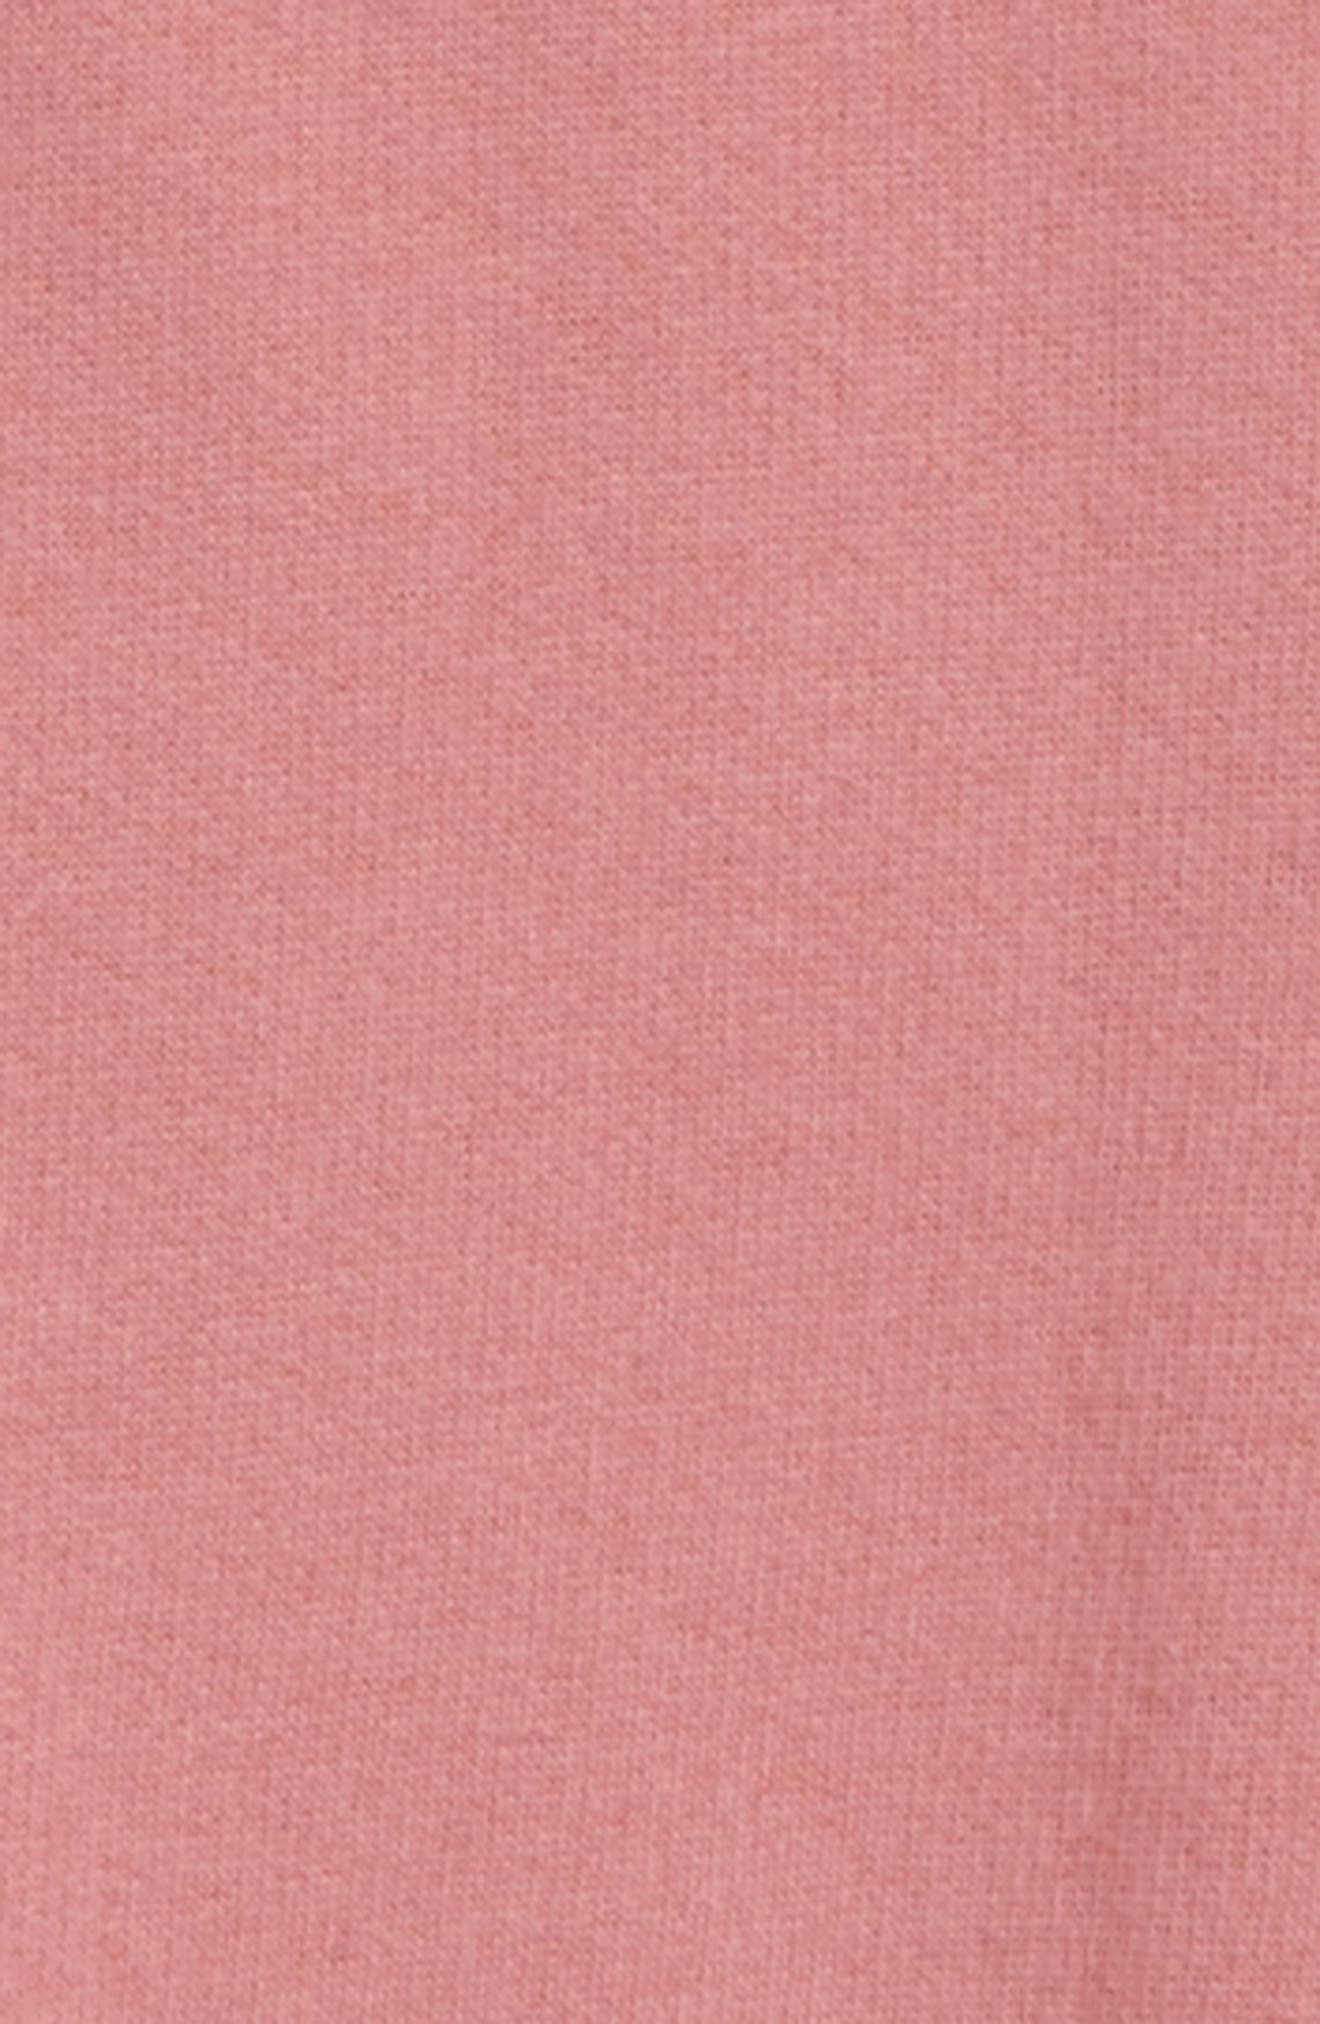 Ruffle Sleeve Sweatshirt,                             Alternate thumbnail 2, color,                             680